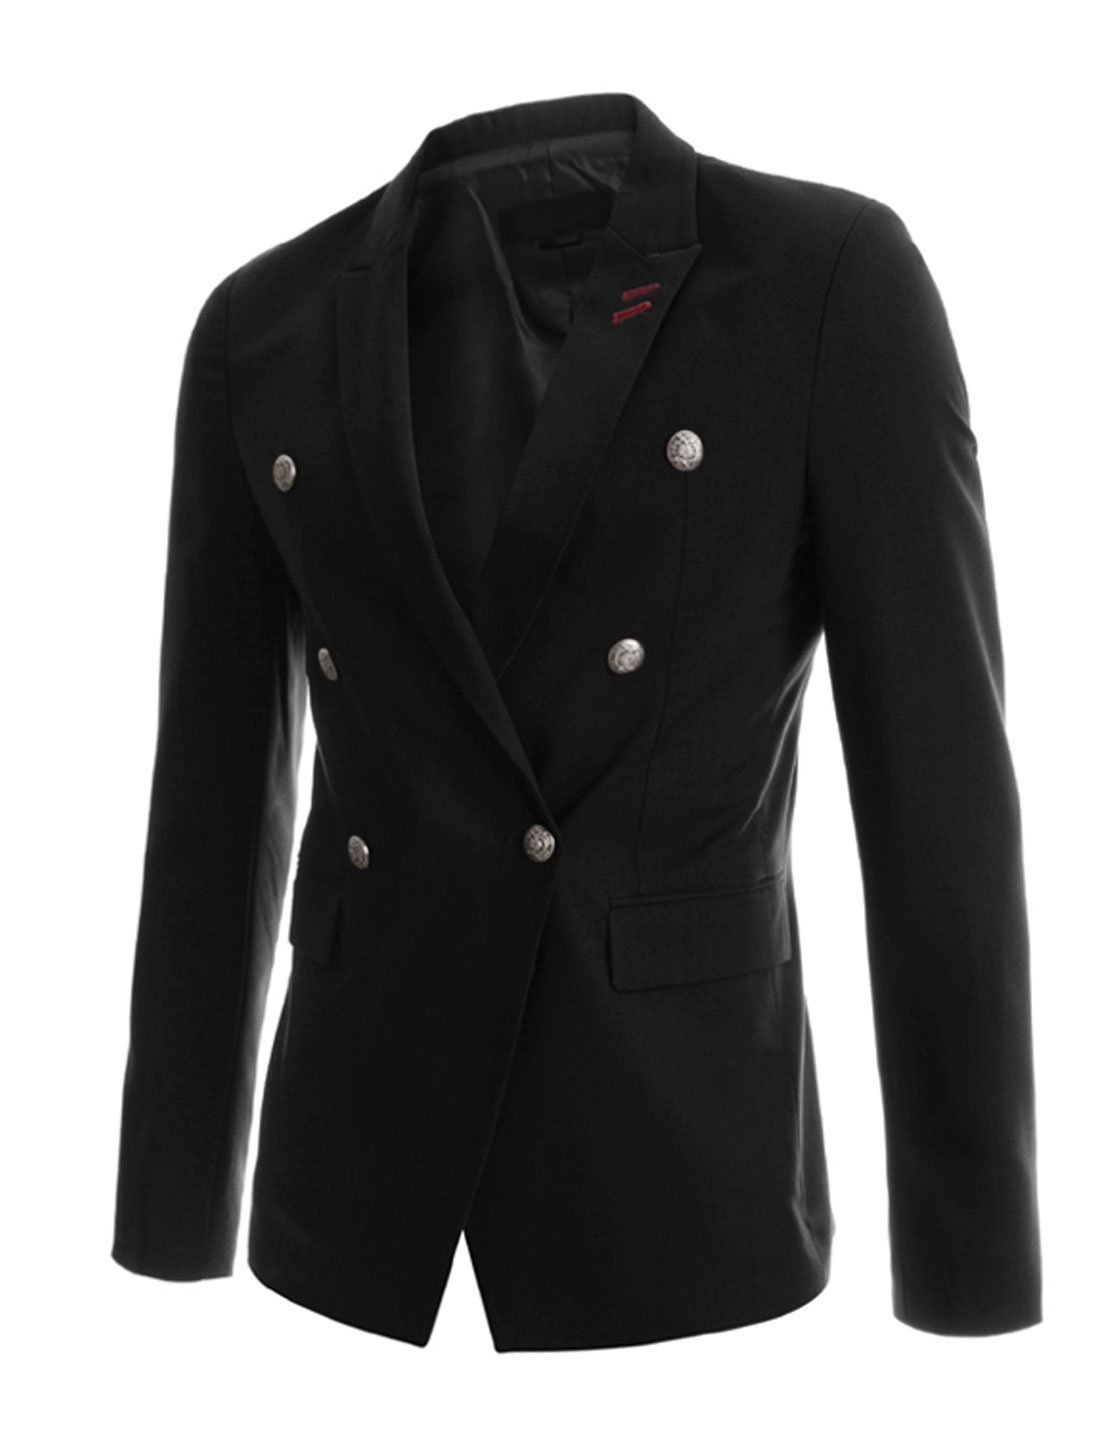 Men Long Sleeve Peaked Lapel Flap Pockets Button Closure Casual Blazer Black M